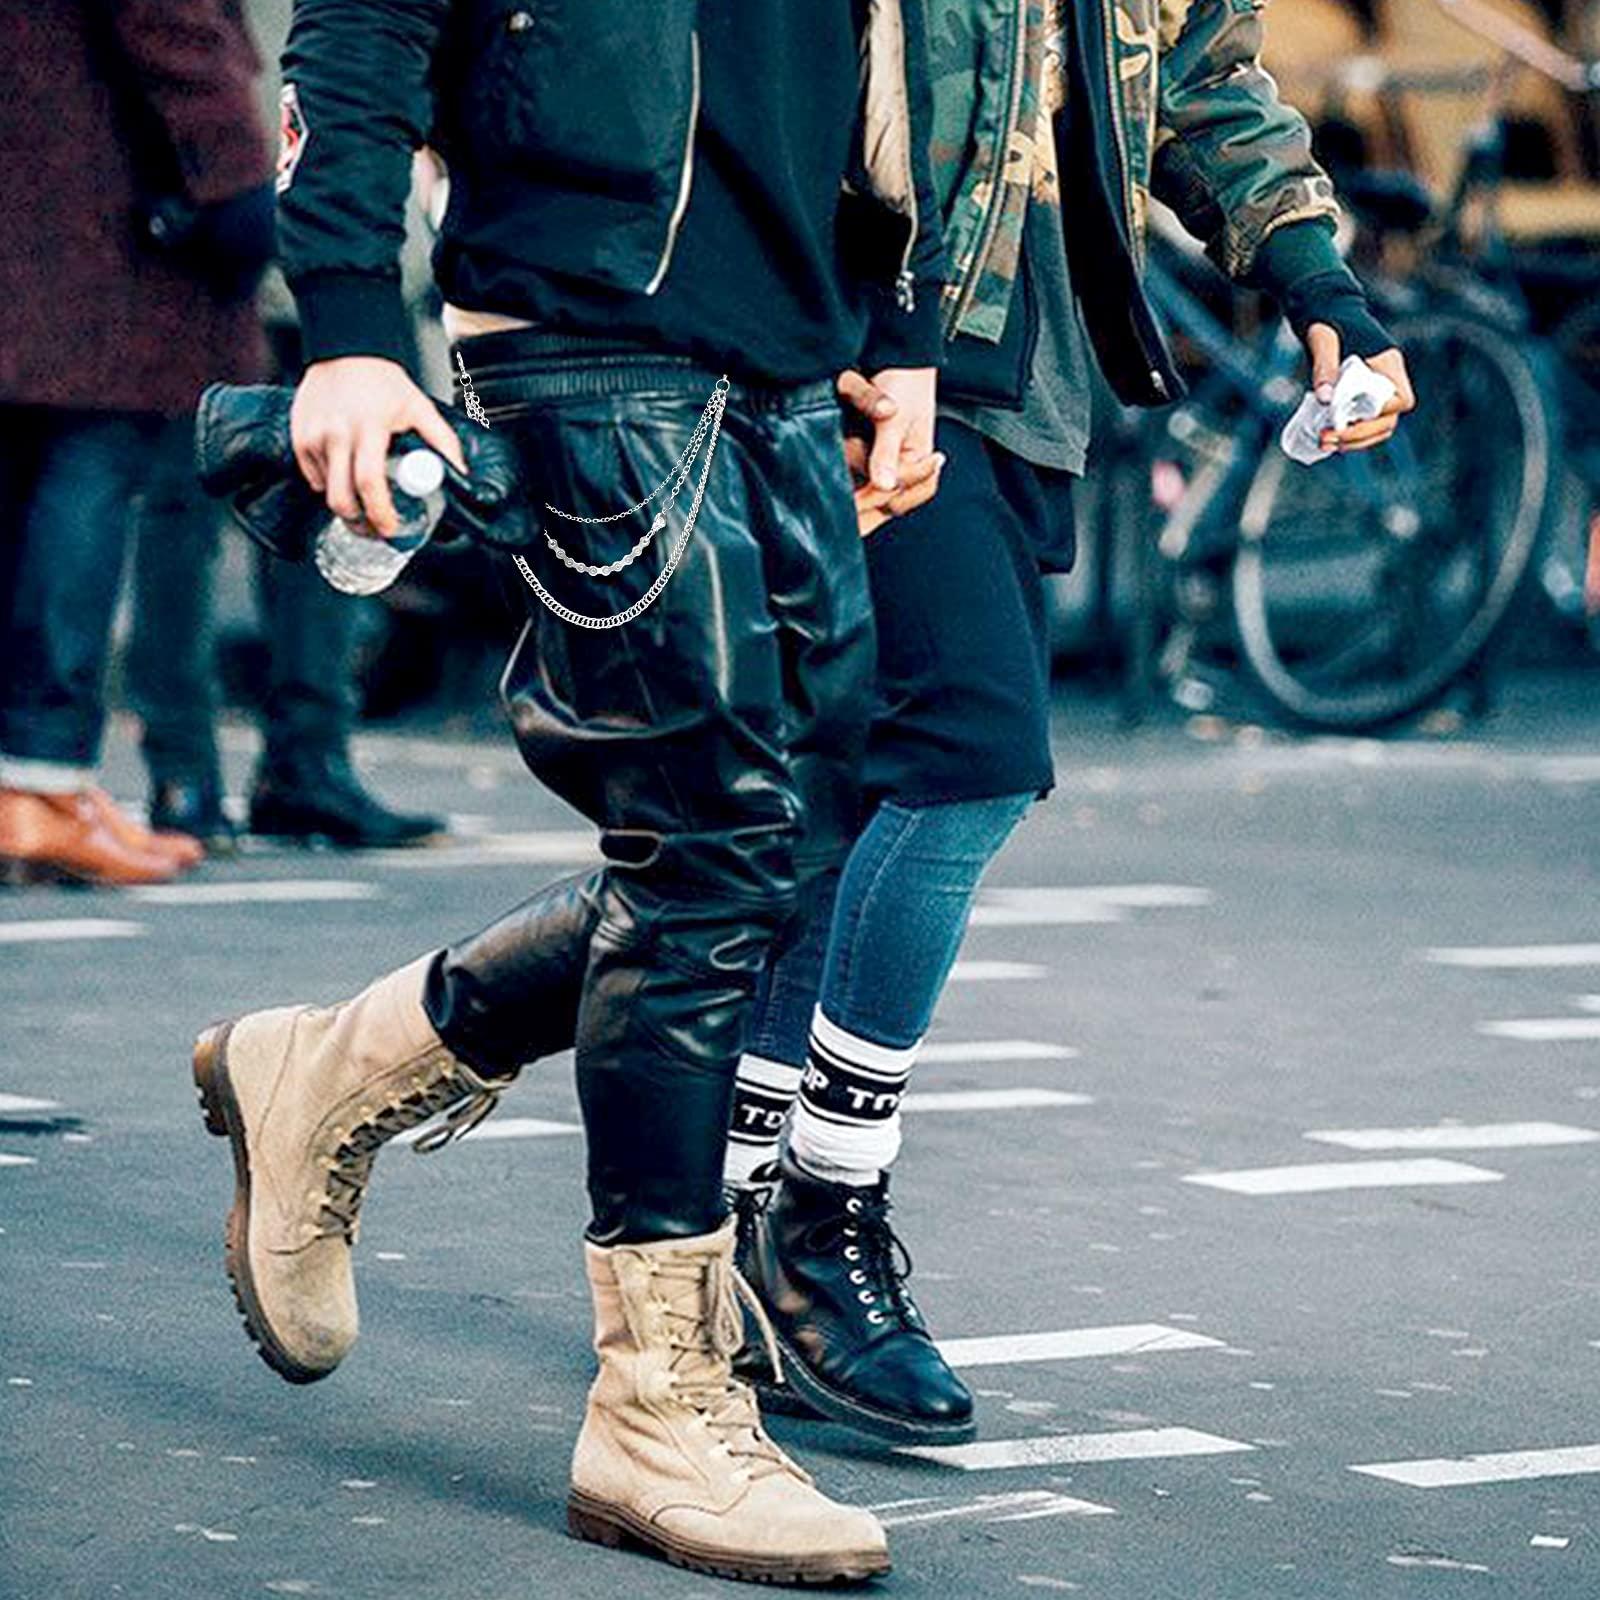 Pants Chain for Men Women,Biker Skull Chain Wallet,Long Cool EMO Punk Trousers Pocket Belt Key Chains for Hip Hop Rock Jean Gothic